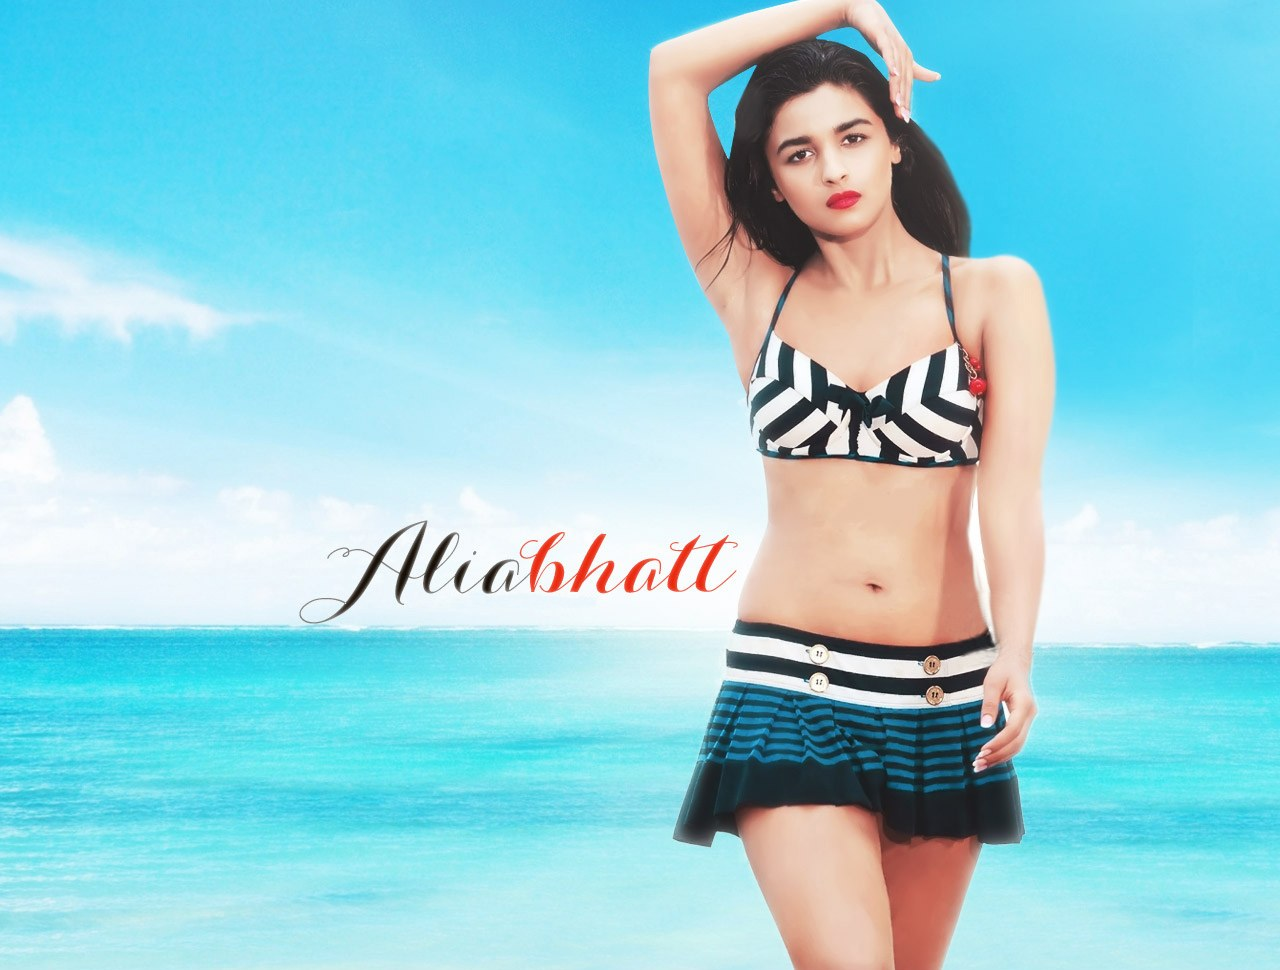 alia bhatt hot latest images 2017 | alia bhatt cute photo and hd